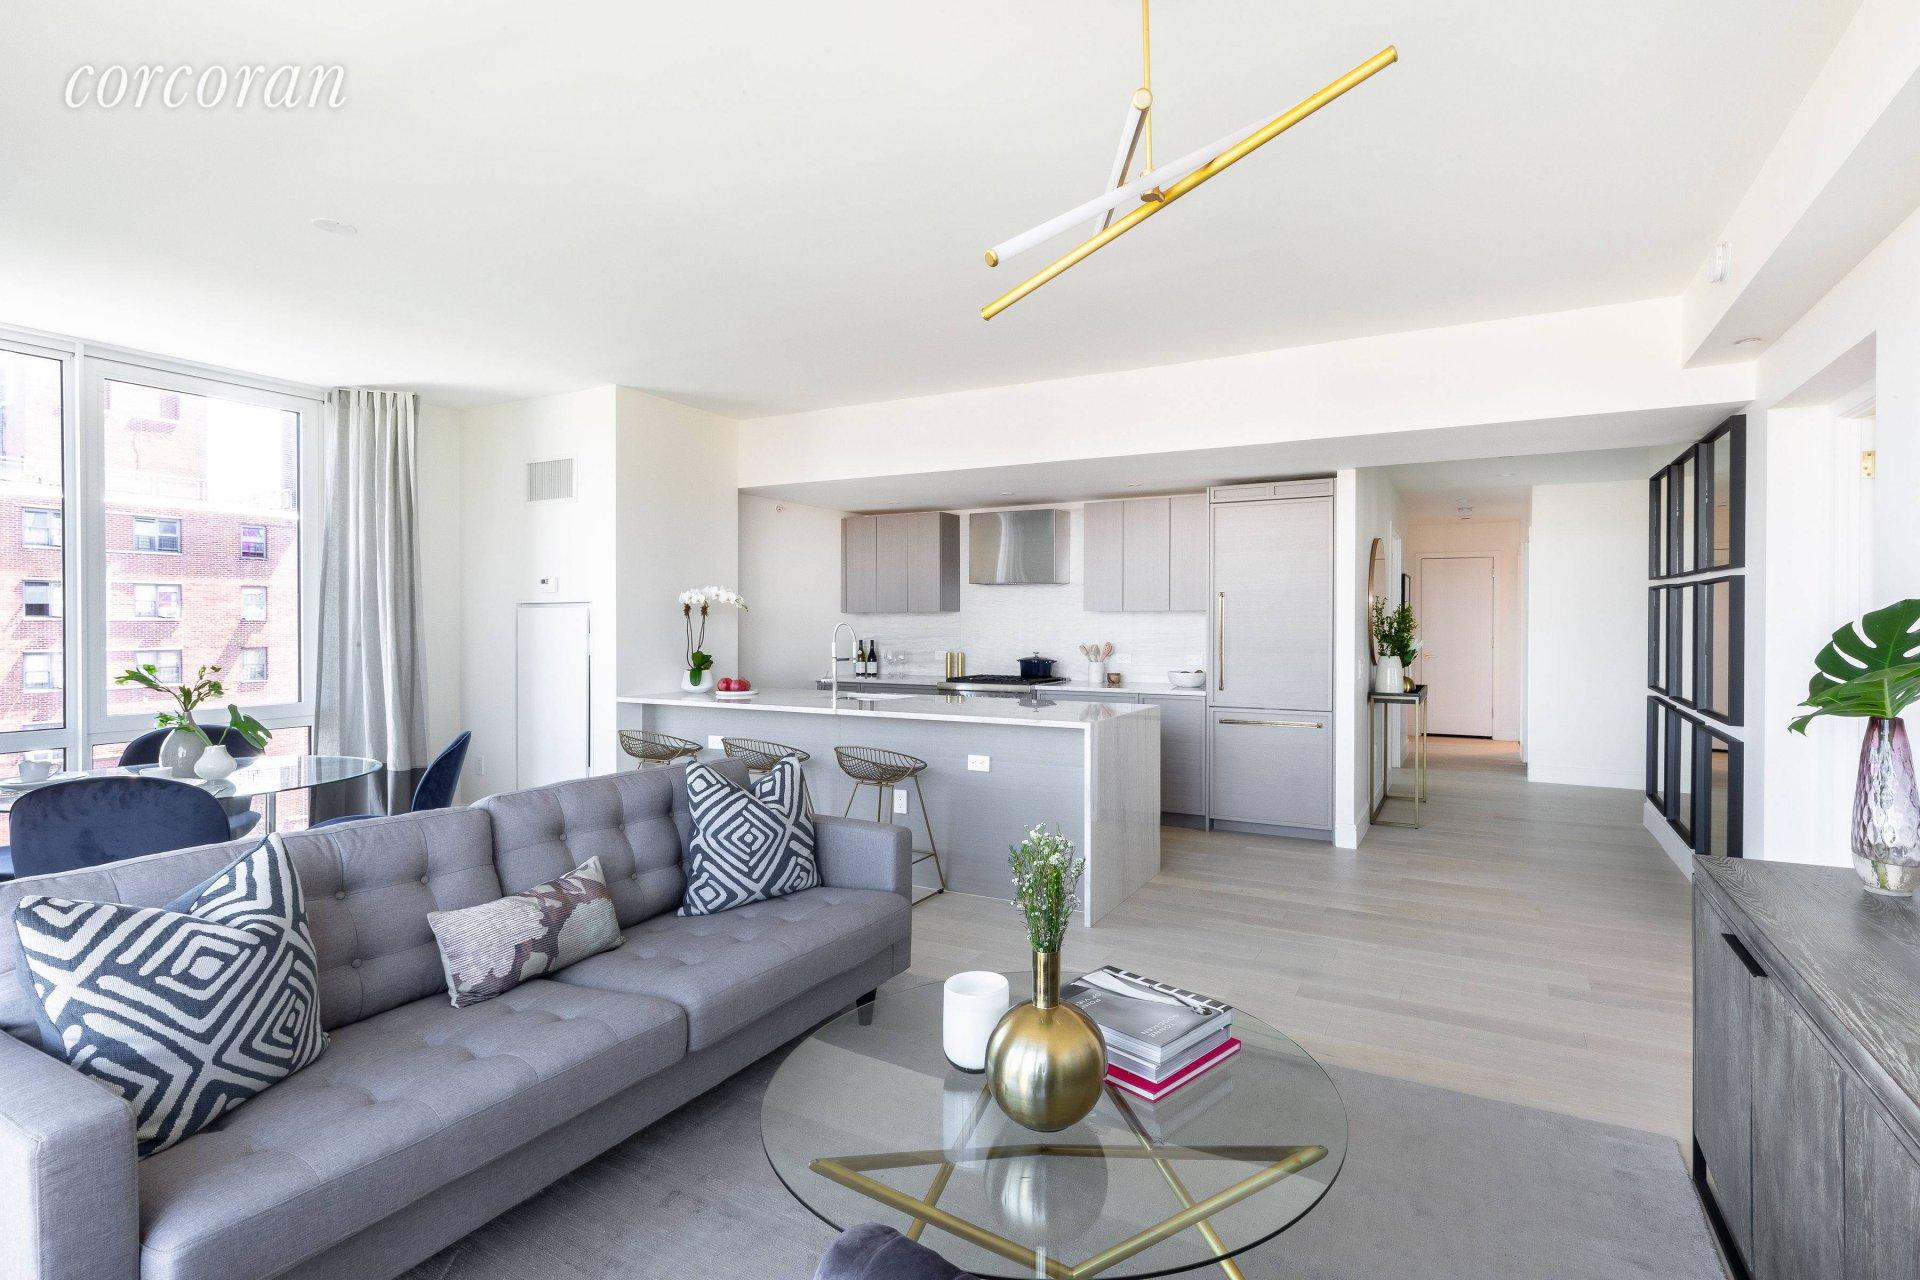 Ad Sale Apartment New York (10029) ref:5732062